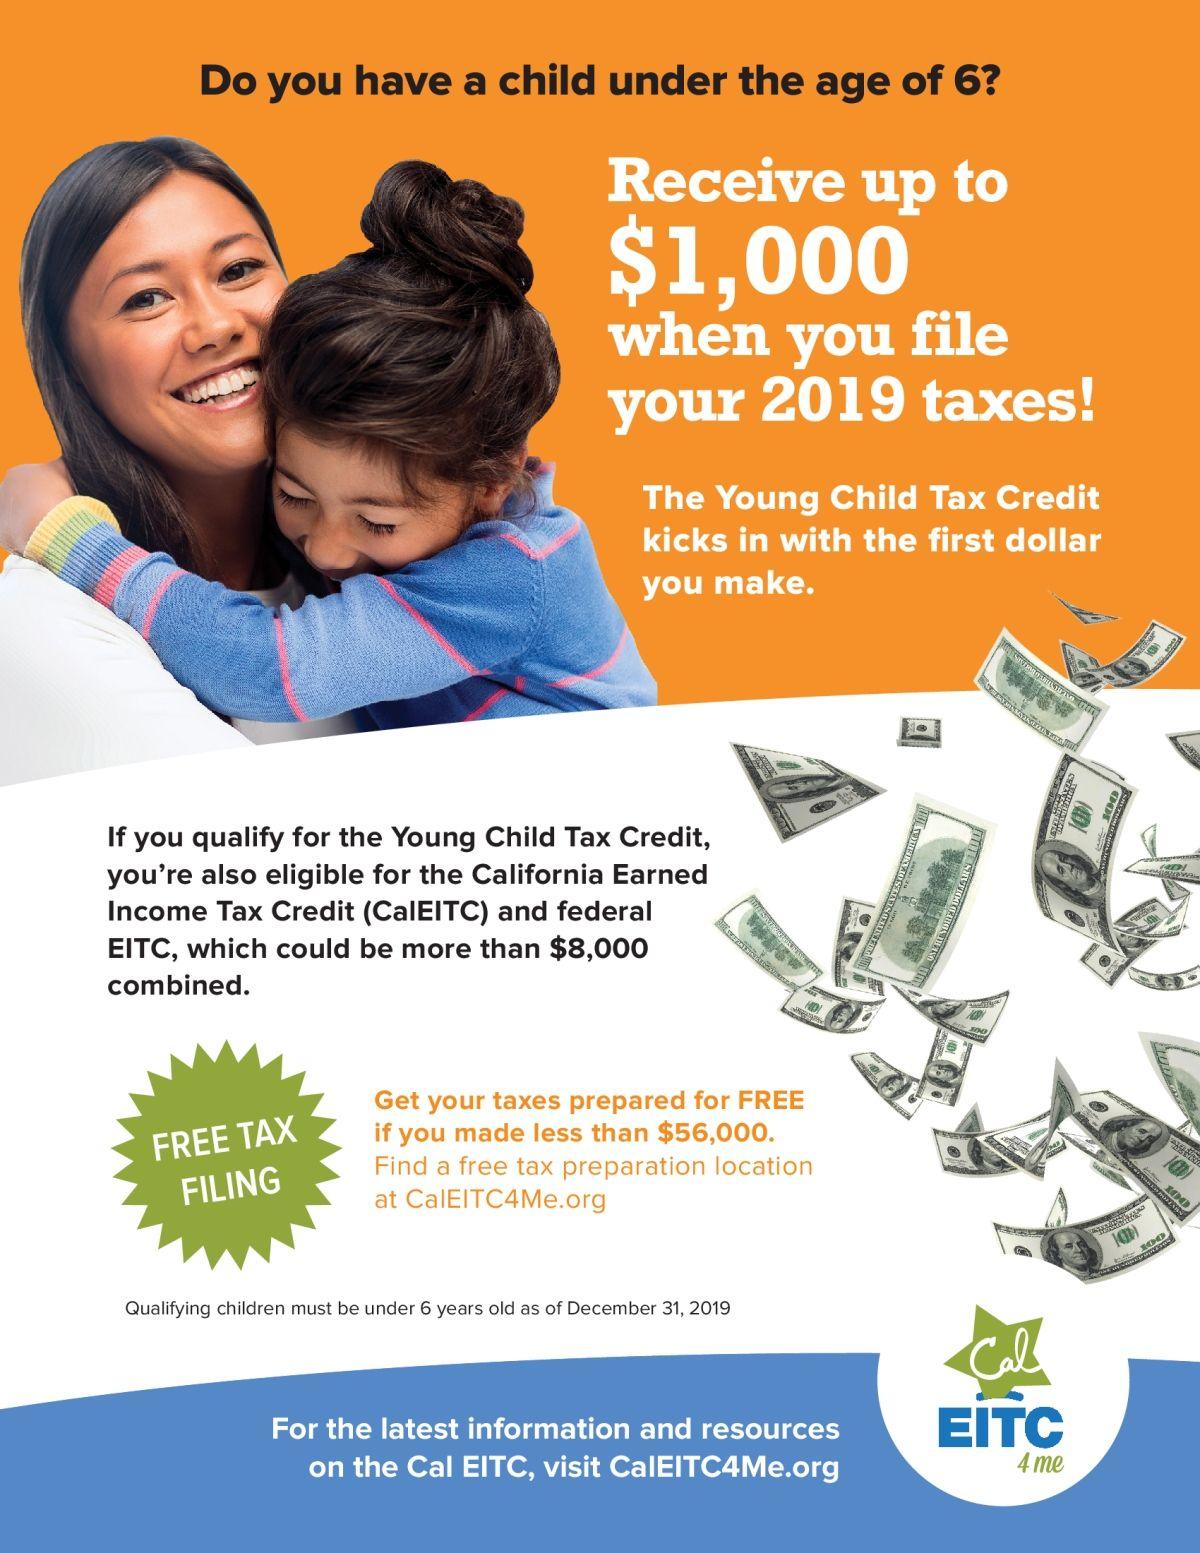 新幼兒稅收抵免政策可獲多達8,000美元 Received up to 8000 from New Young